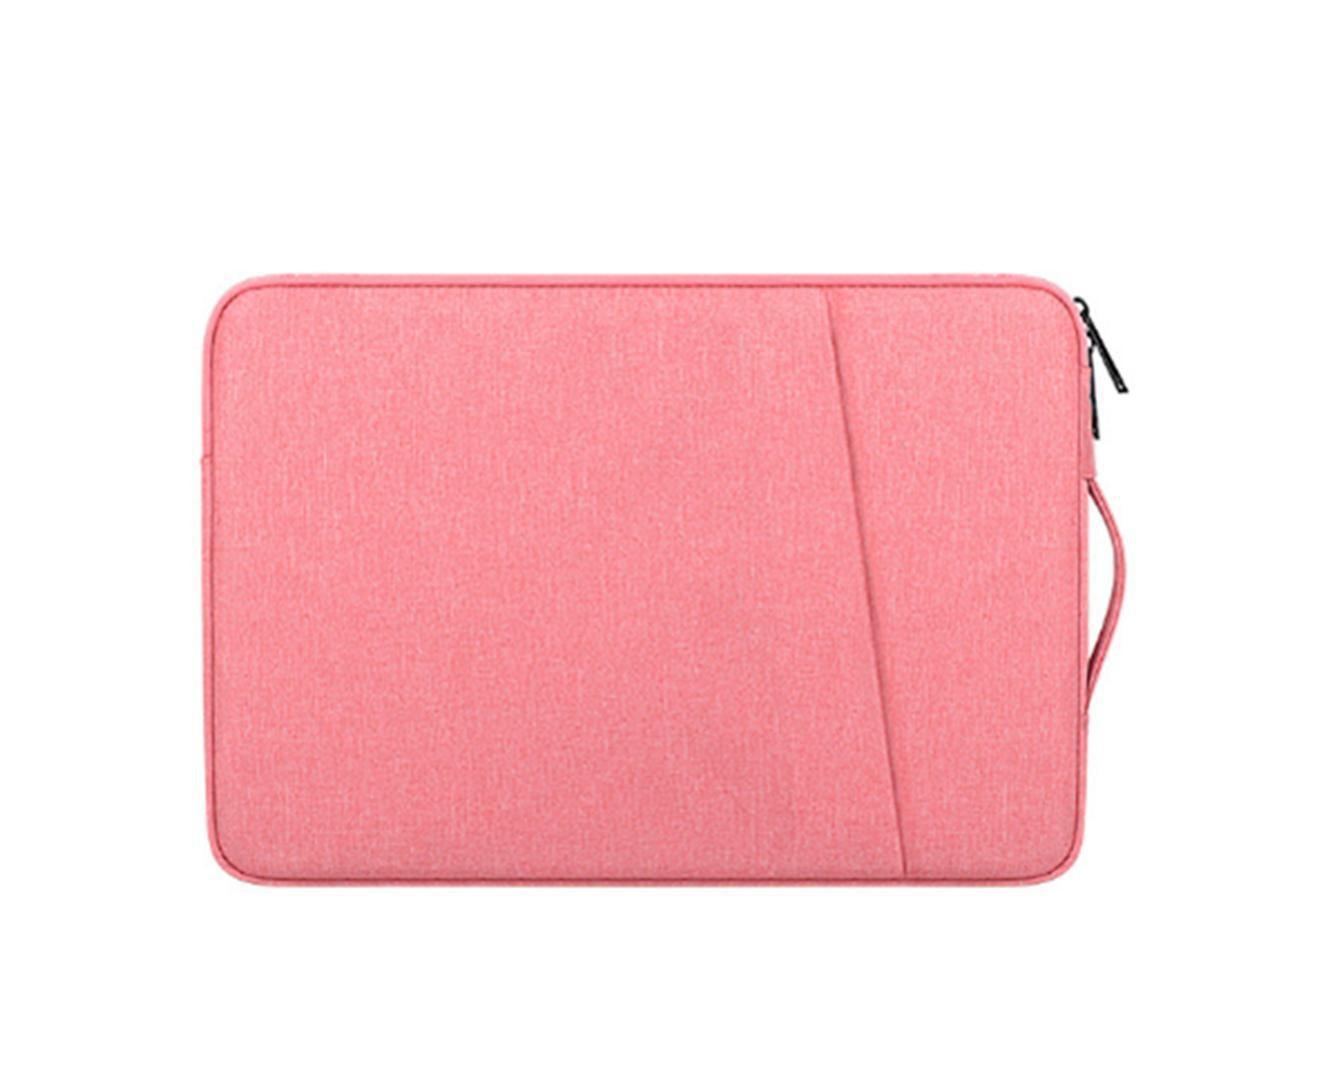 13.3 Inch Waterproof and Shockproof Laptop Bag Macbook Notebook Liner Bag Protective Cover-Pink